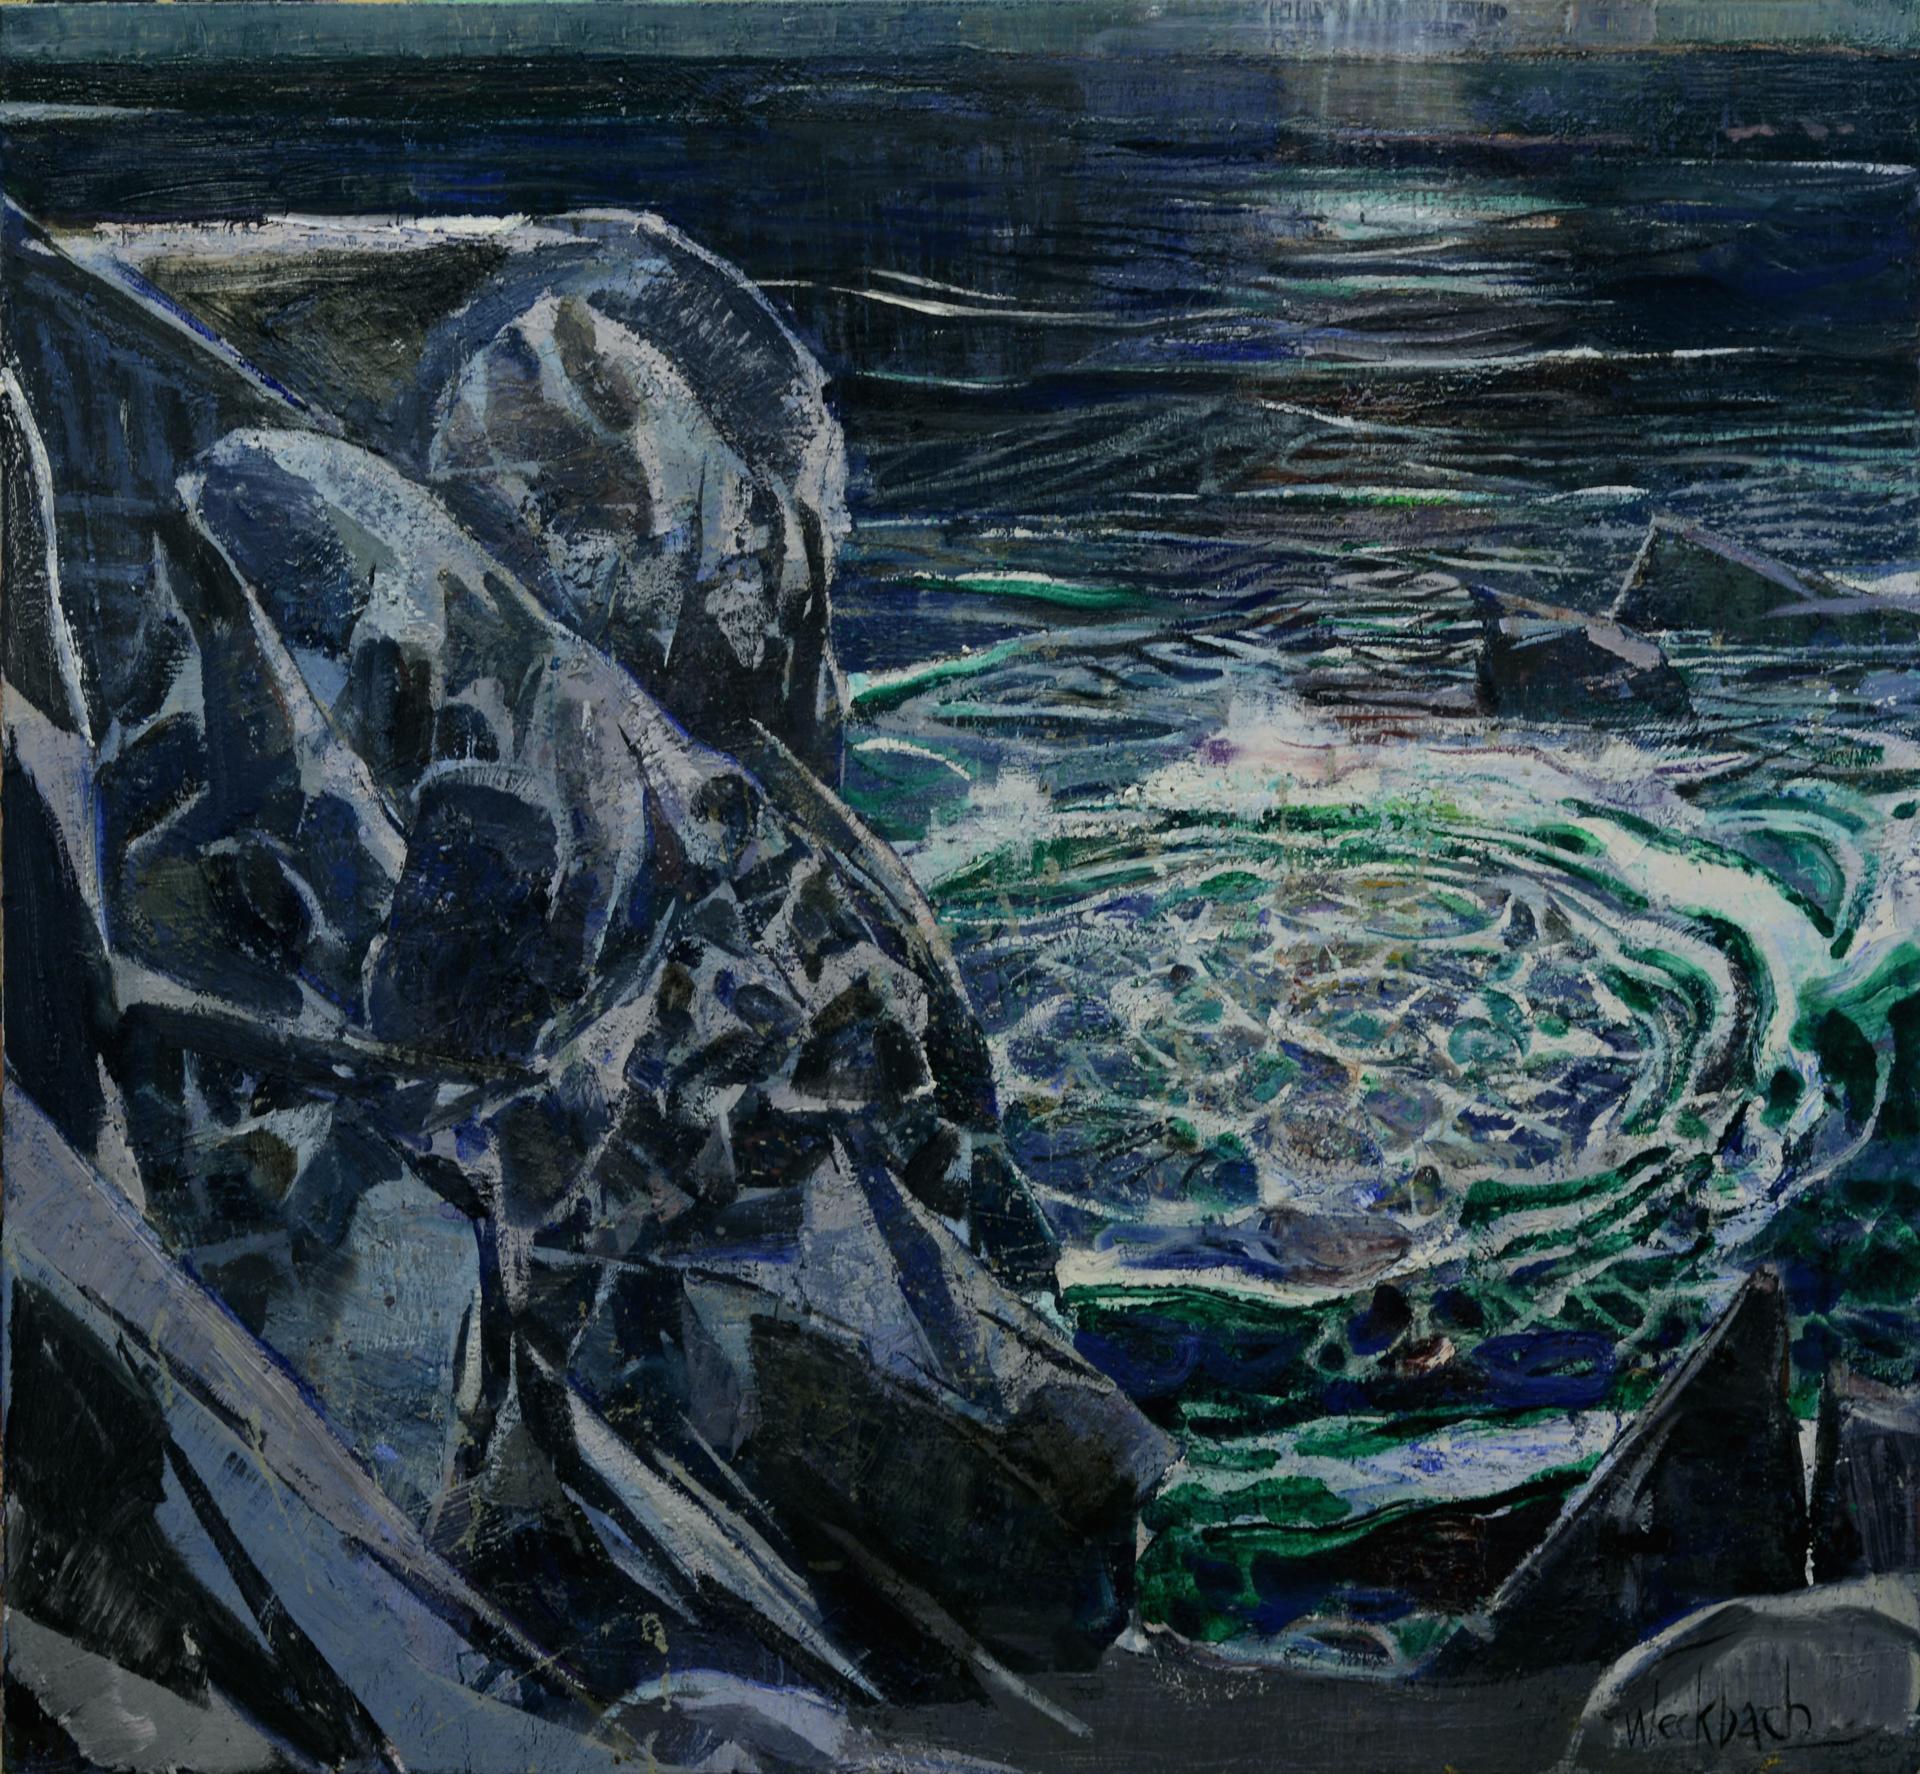 Whirlpool by Kevin Weckbach